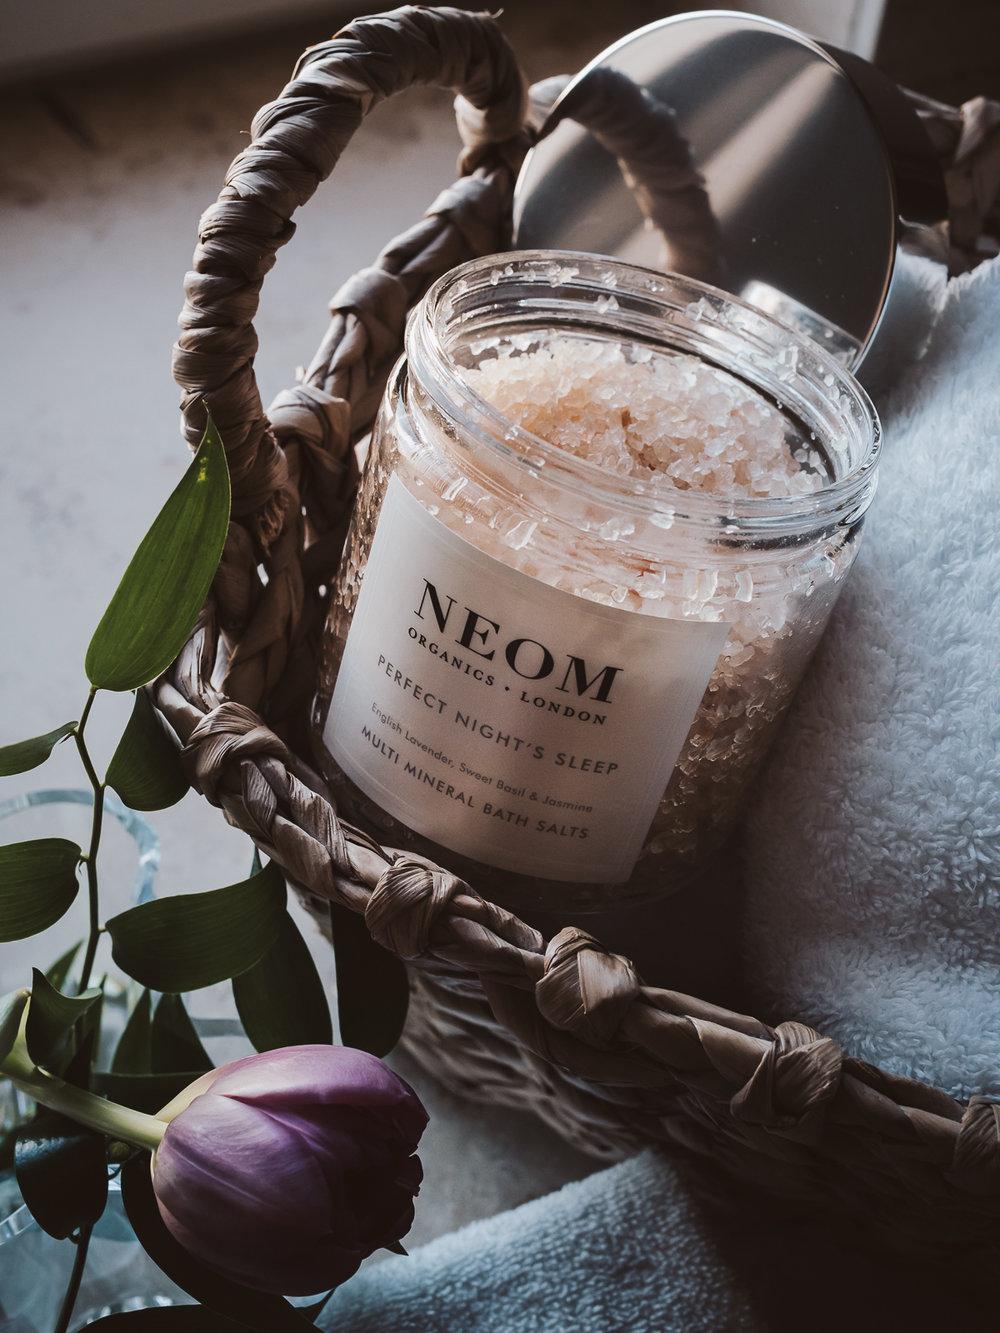 NEOM Multi Mineral Bath Salts - Perfect Night's Sleep